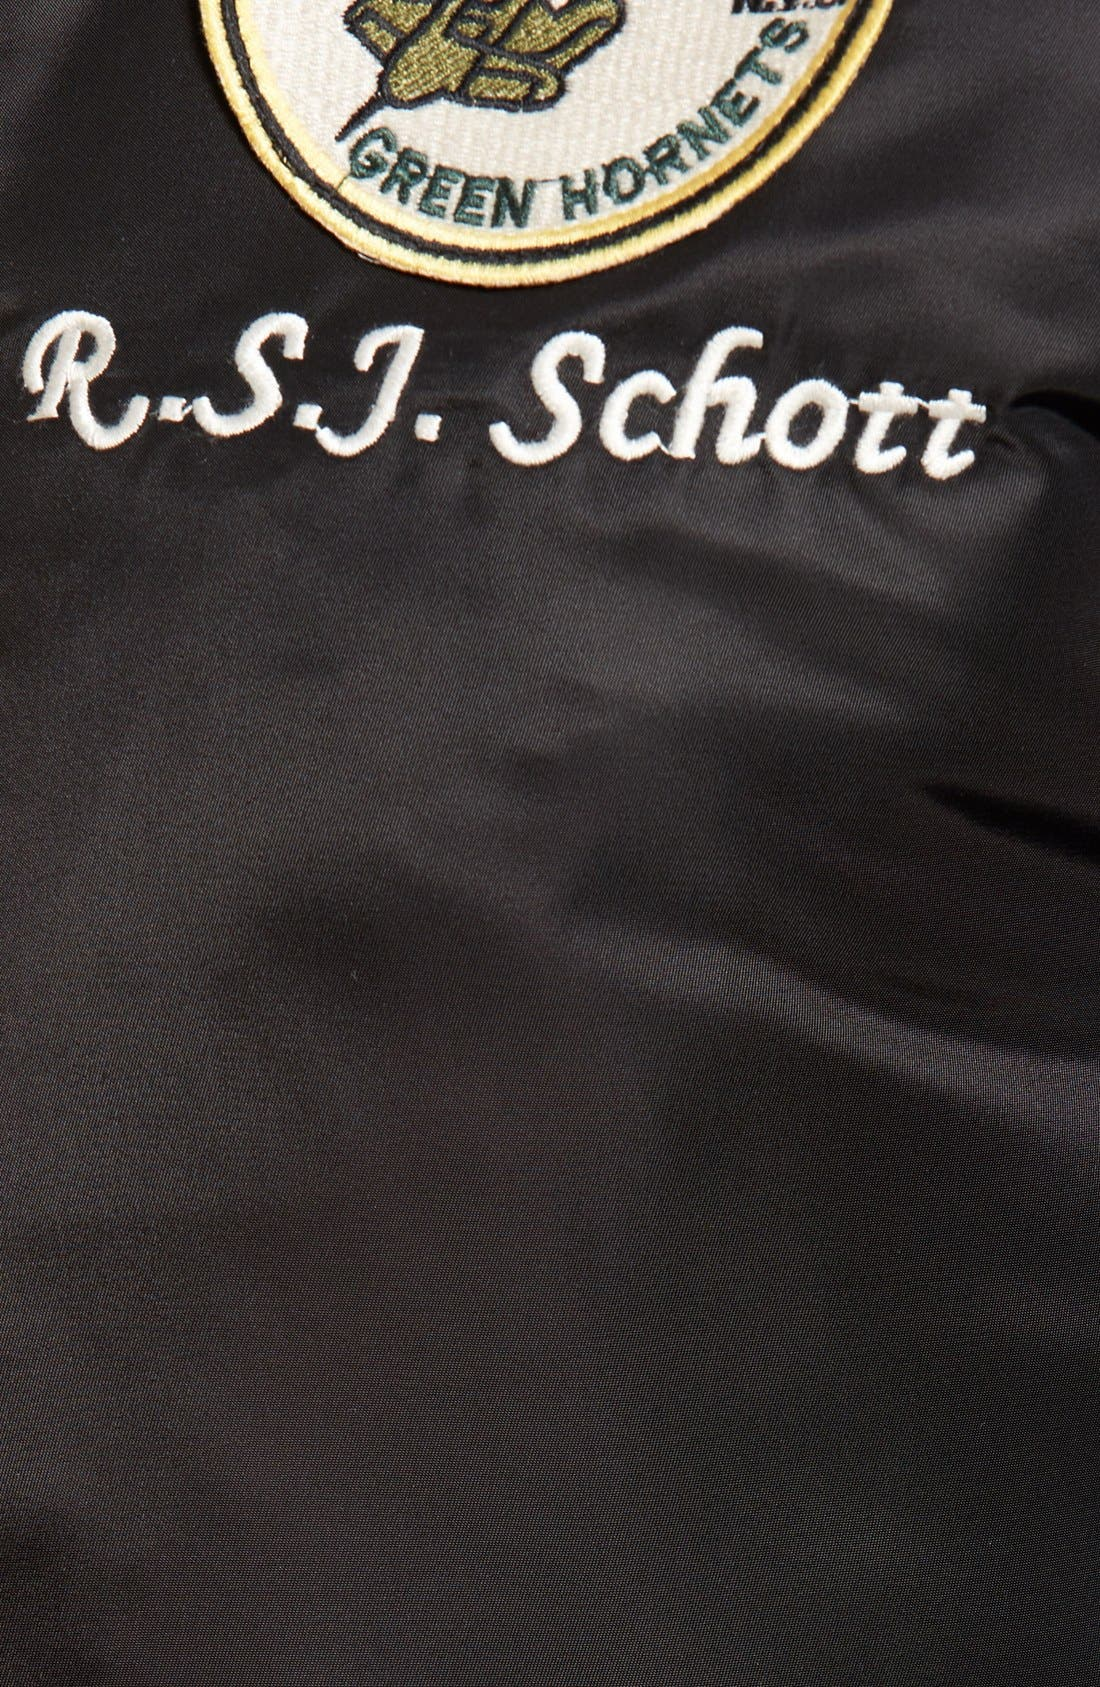 Souvenir MA-1 Flight Jacket,                             Alternate thumbnail 5, color,                             001